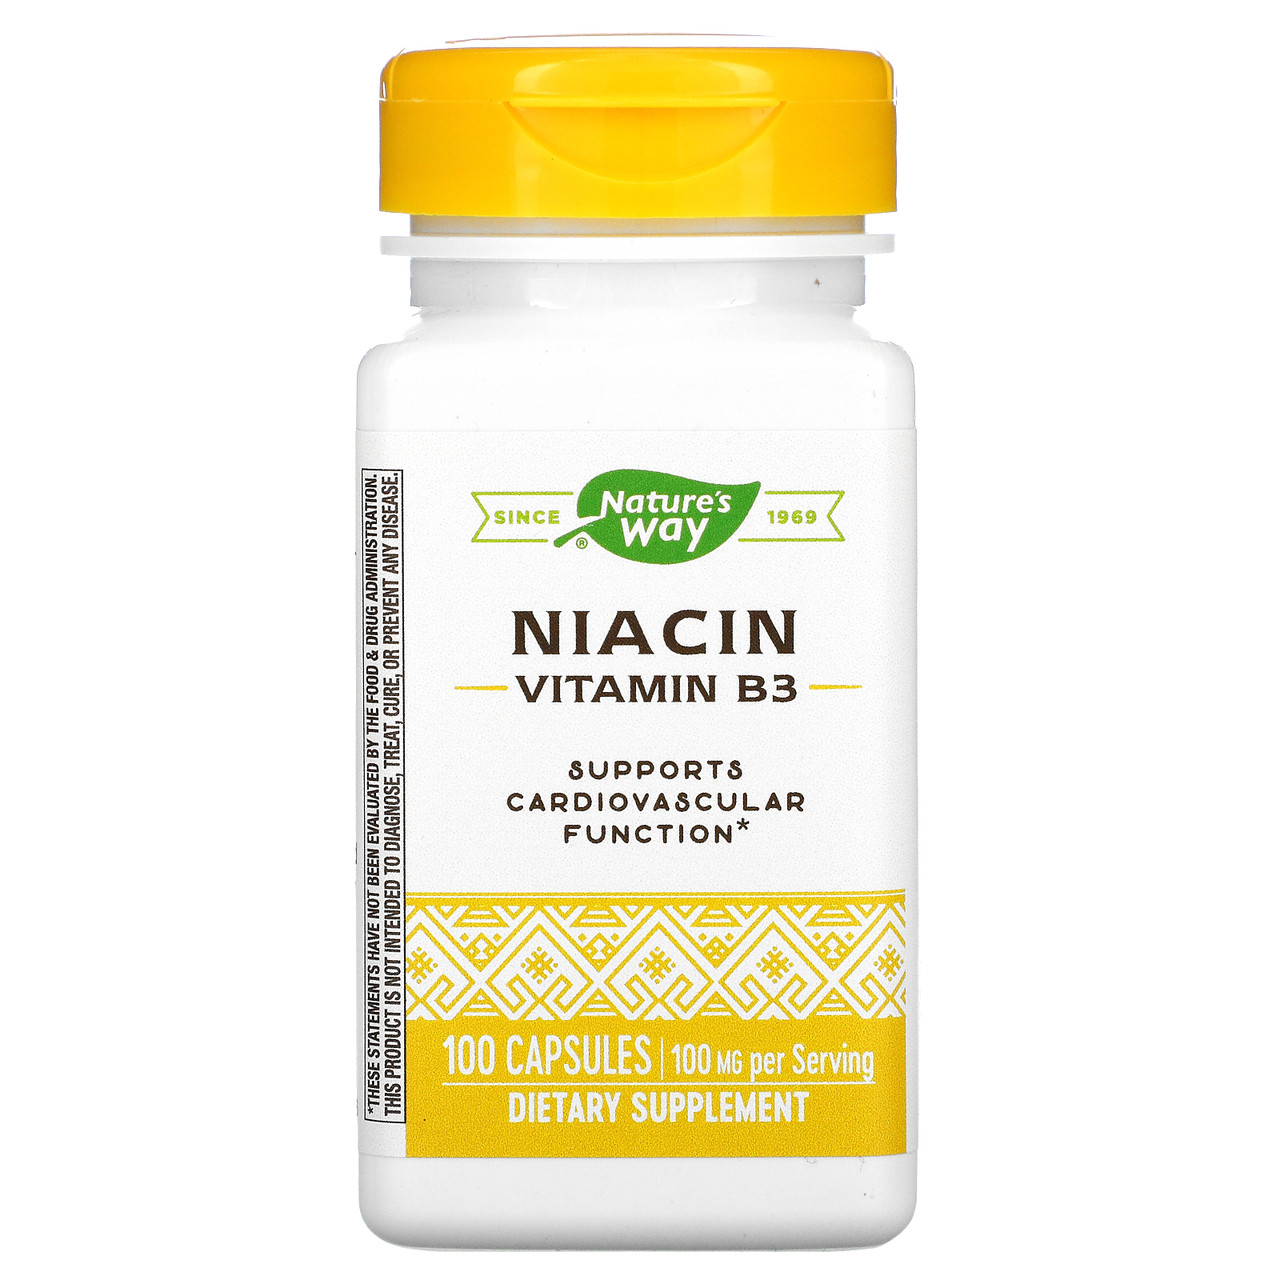 Вітамін В3, nature's Way, 100 мг, 100 капсул